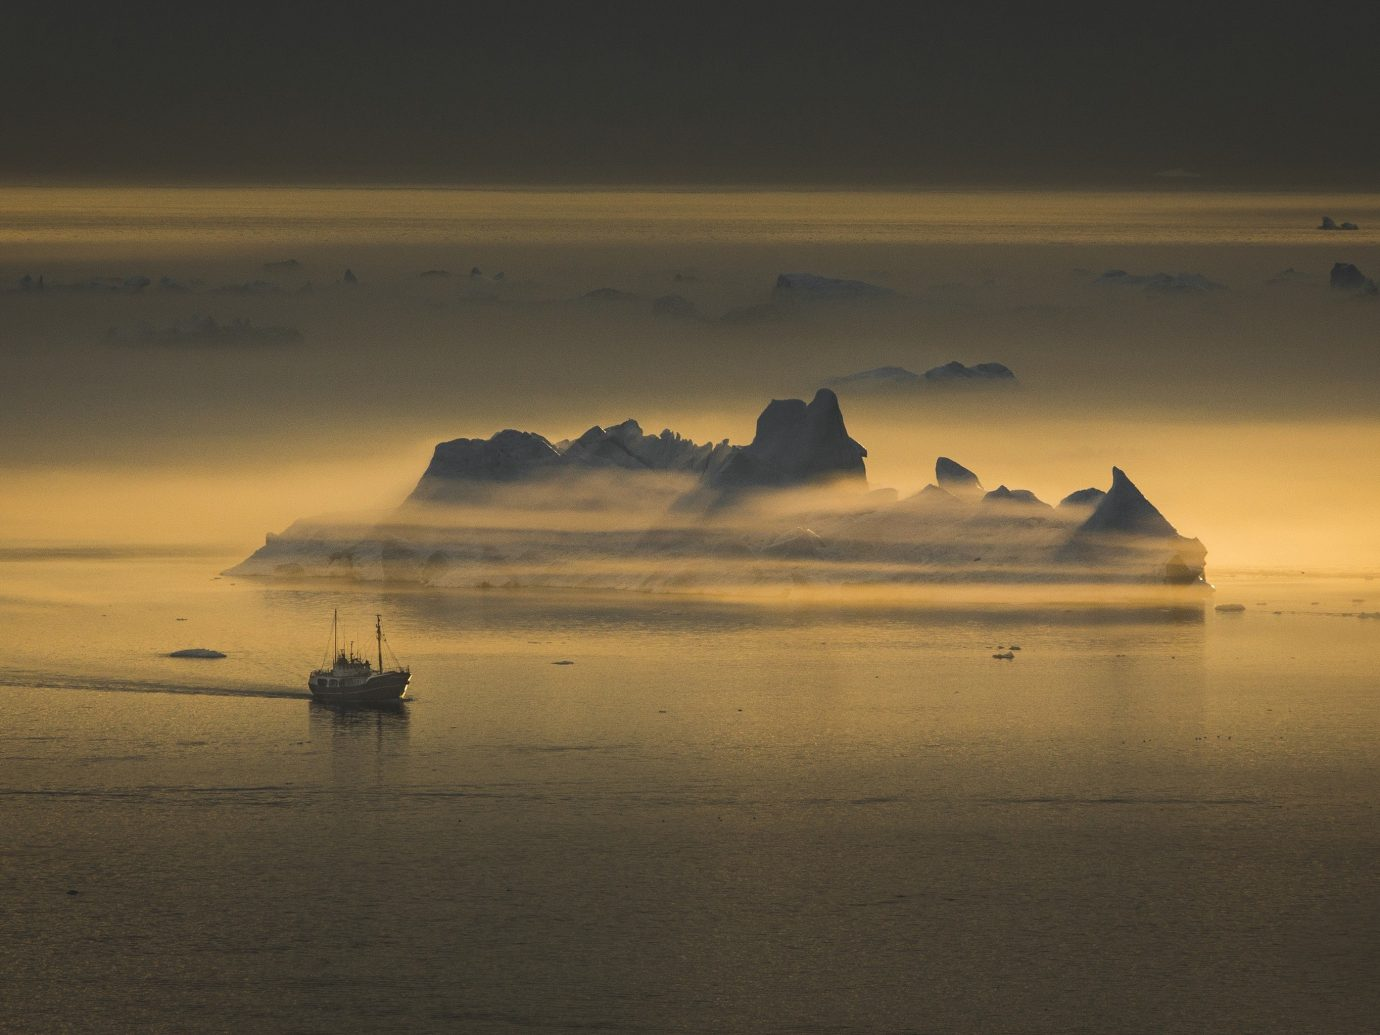 A fishing vessel passes an iceberg near the Ilulissat ice fjord